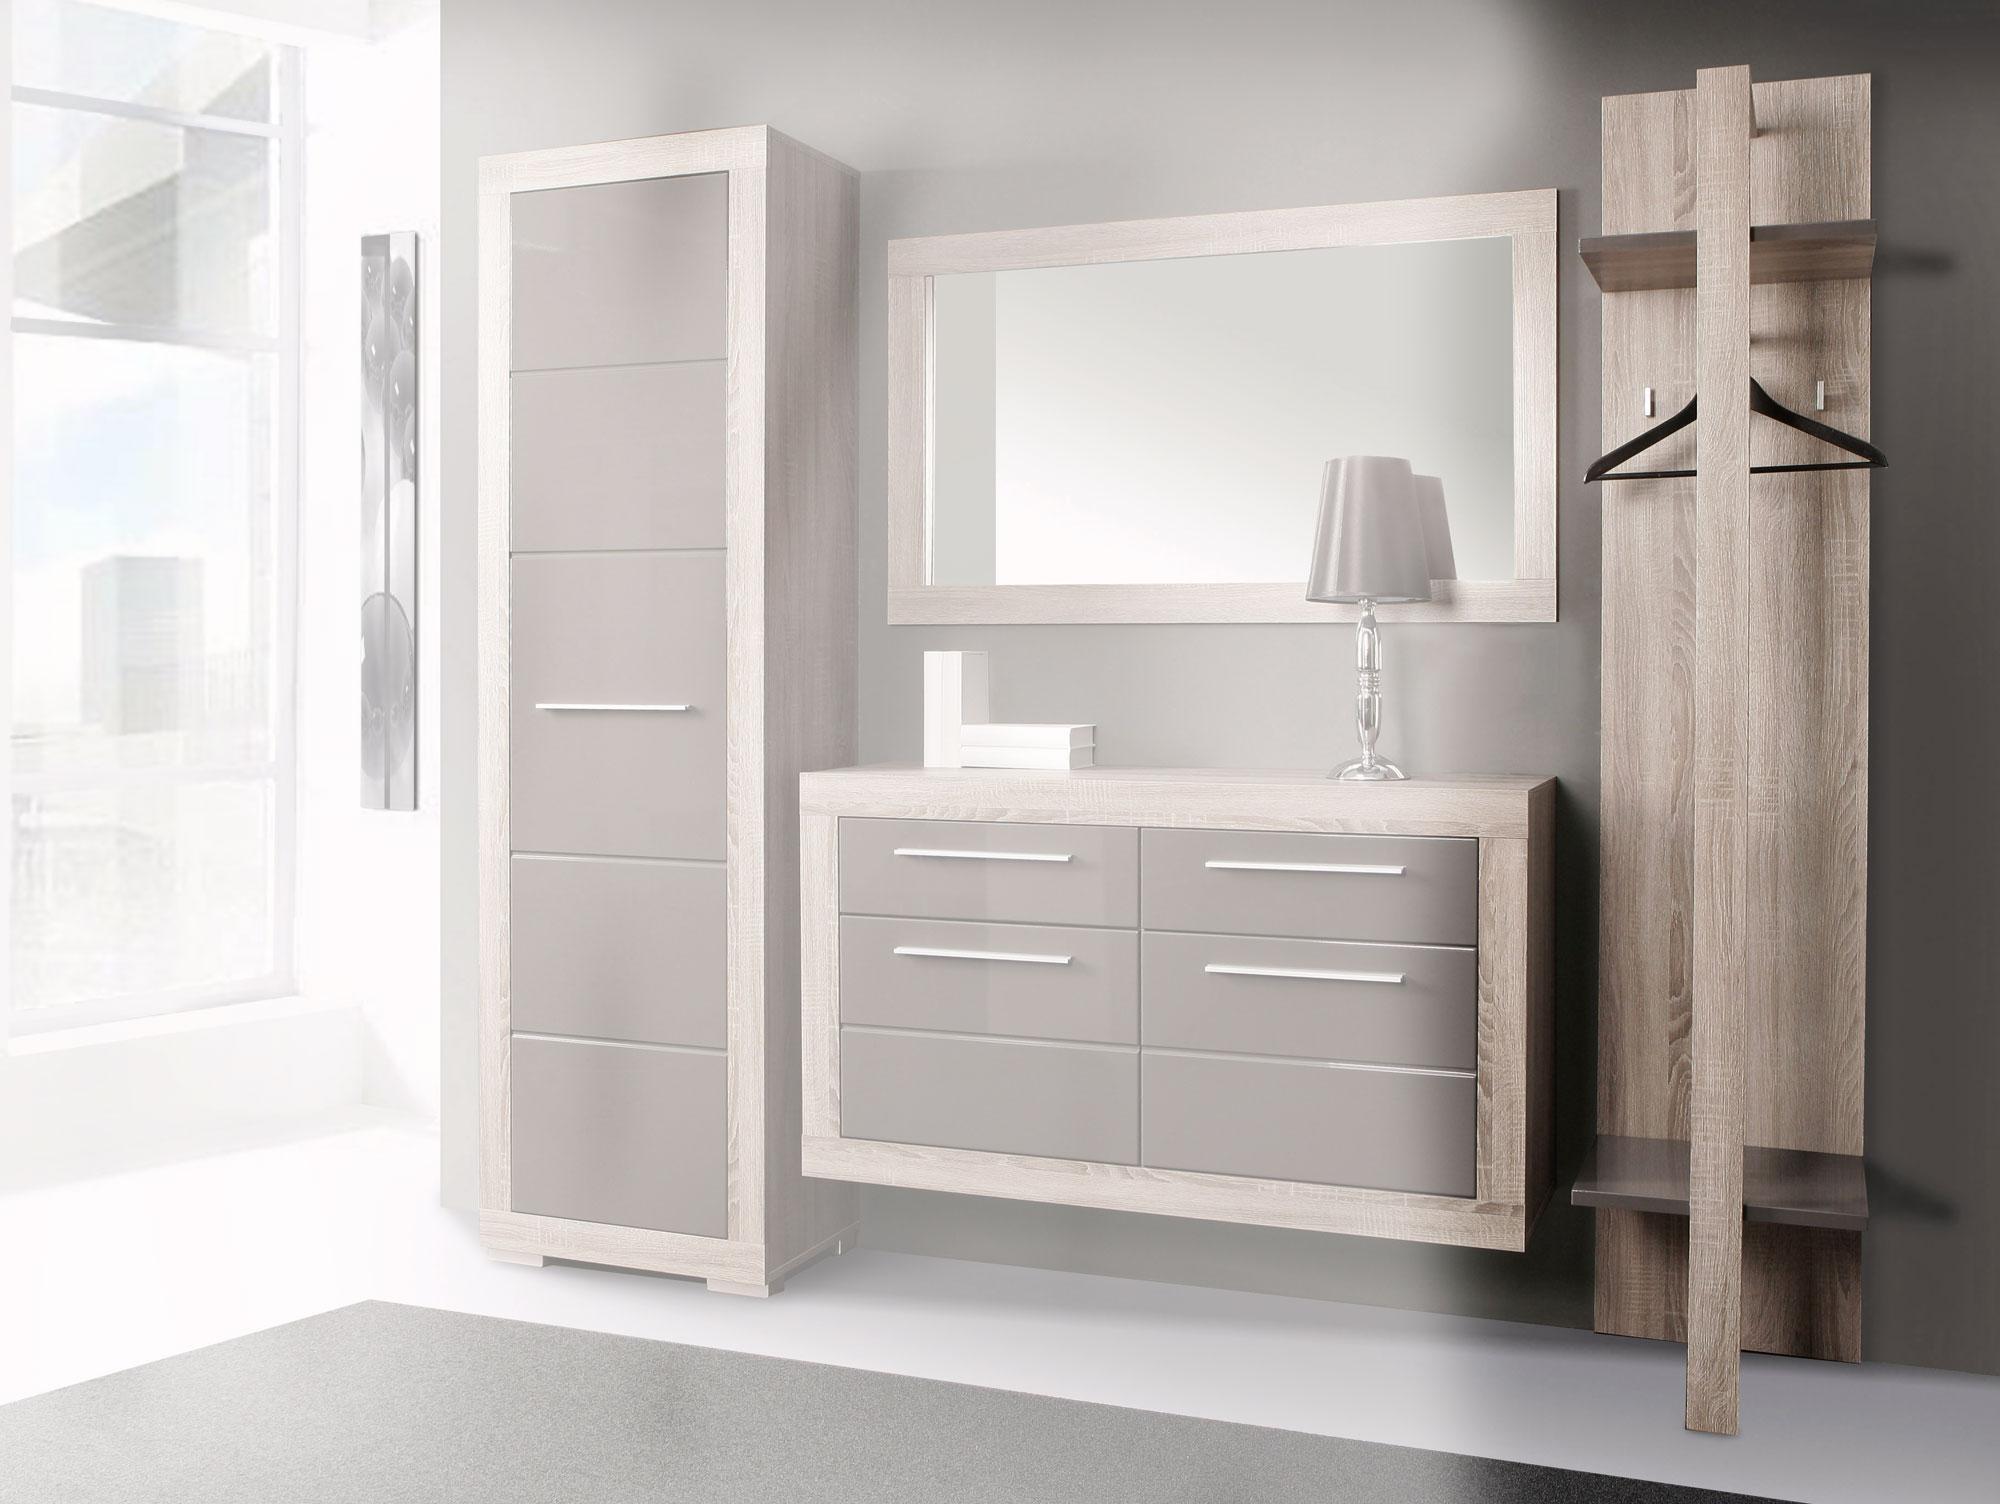 Amberg garderobenpaneel eiche sonoma grau grau hochgl for Garderobenpaneel grau